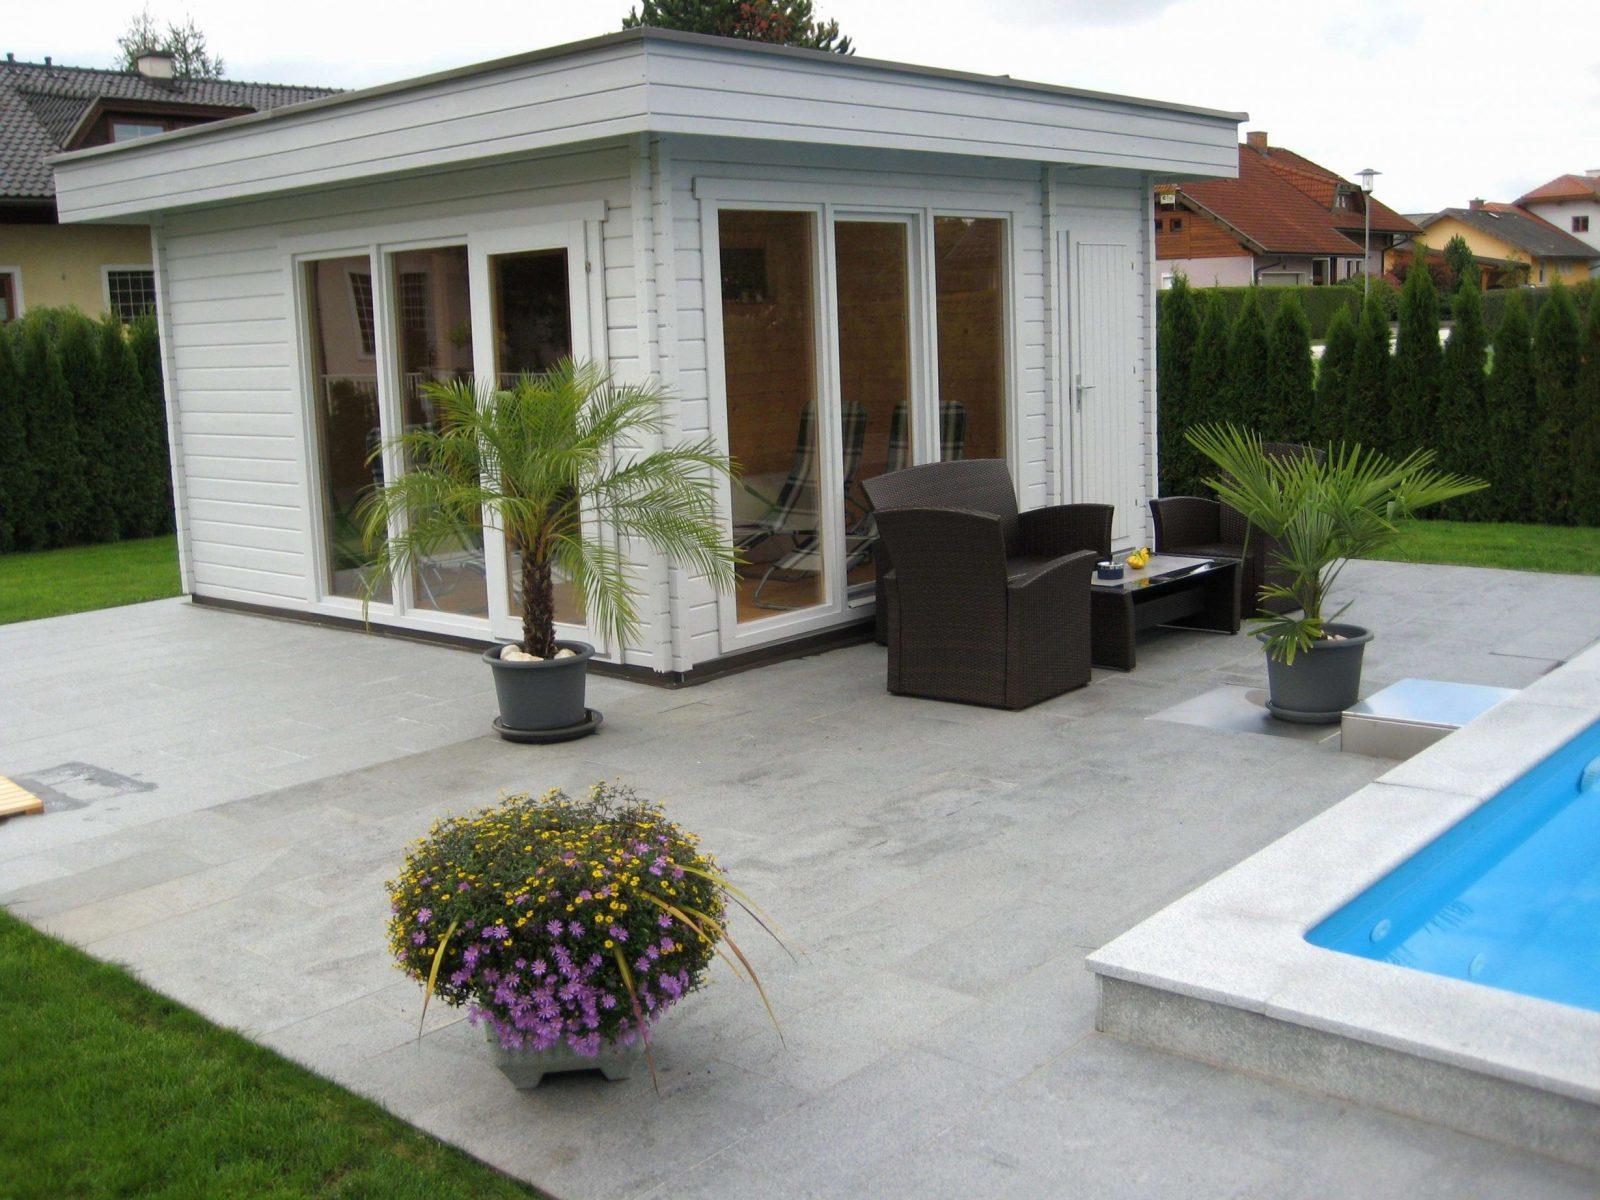 Garten Hexenhaus Selber Bauen Inspirierend Gartenhaus Garten Genial von Gartenhaus Modern Selber Bauen Bild